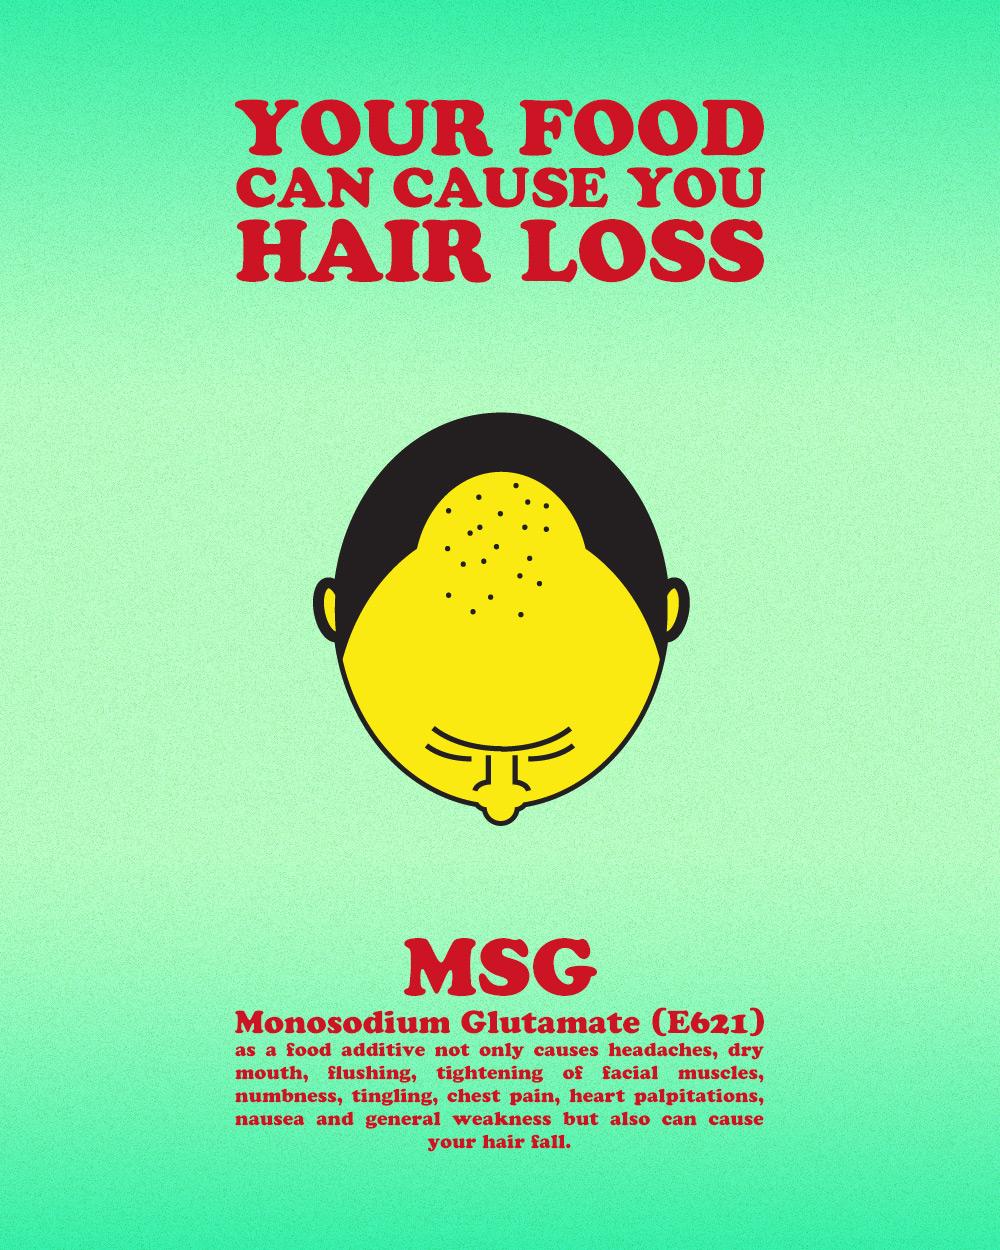 MSG Disadvantage